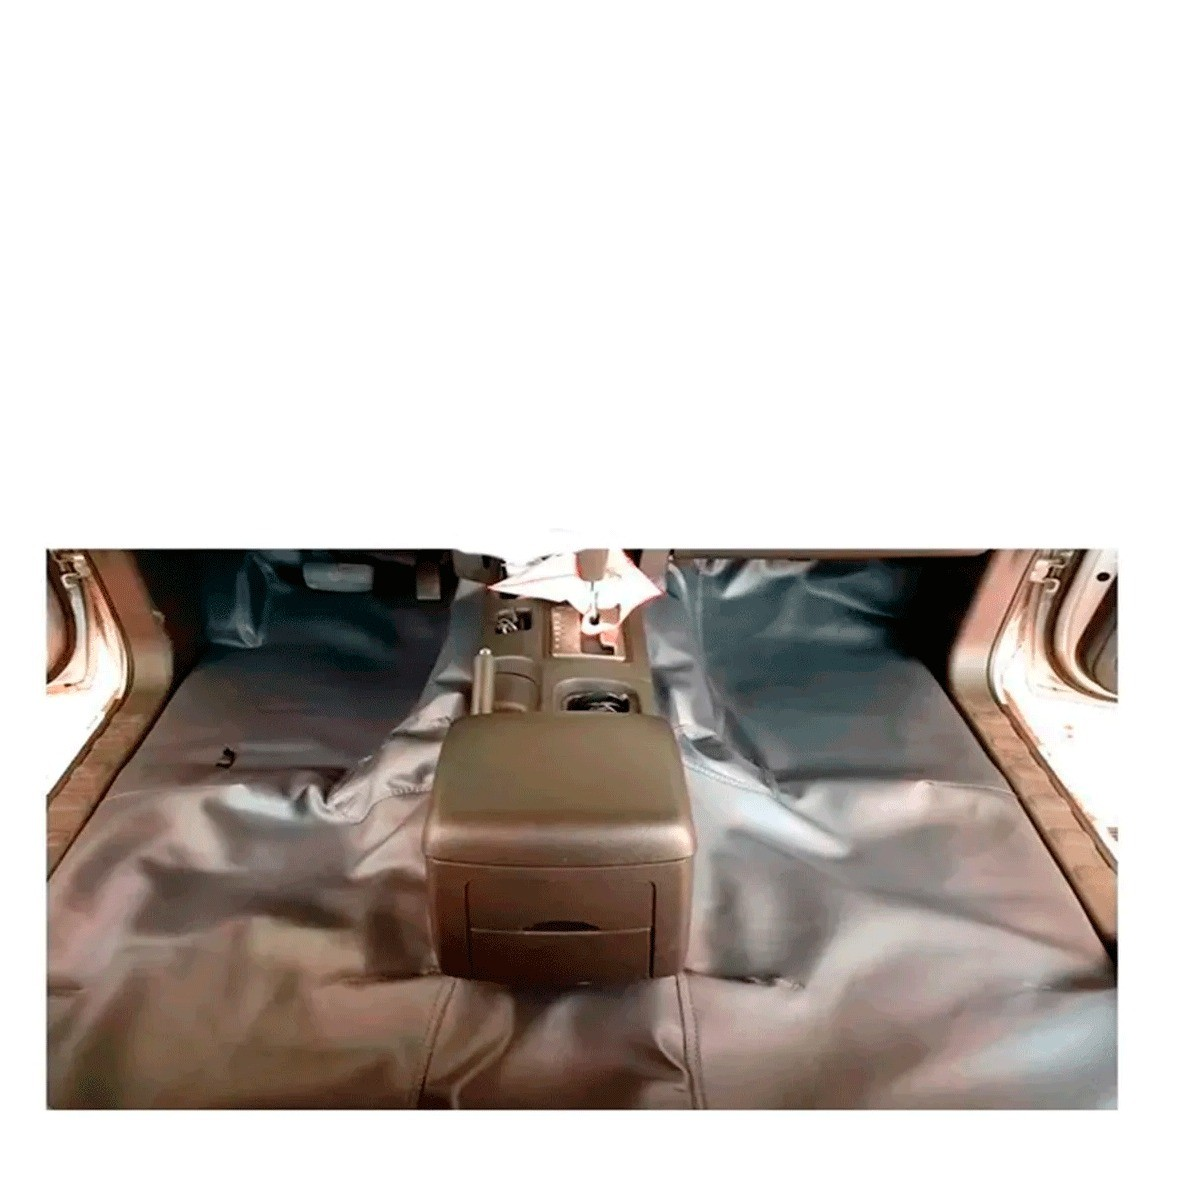 Tapete Automotivo Assoalho Emborrachado Bidim Ford Fiesta 2005 a 2015